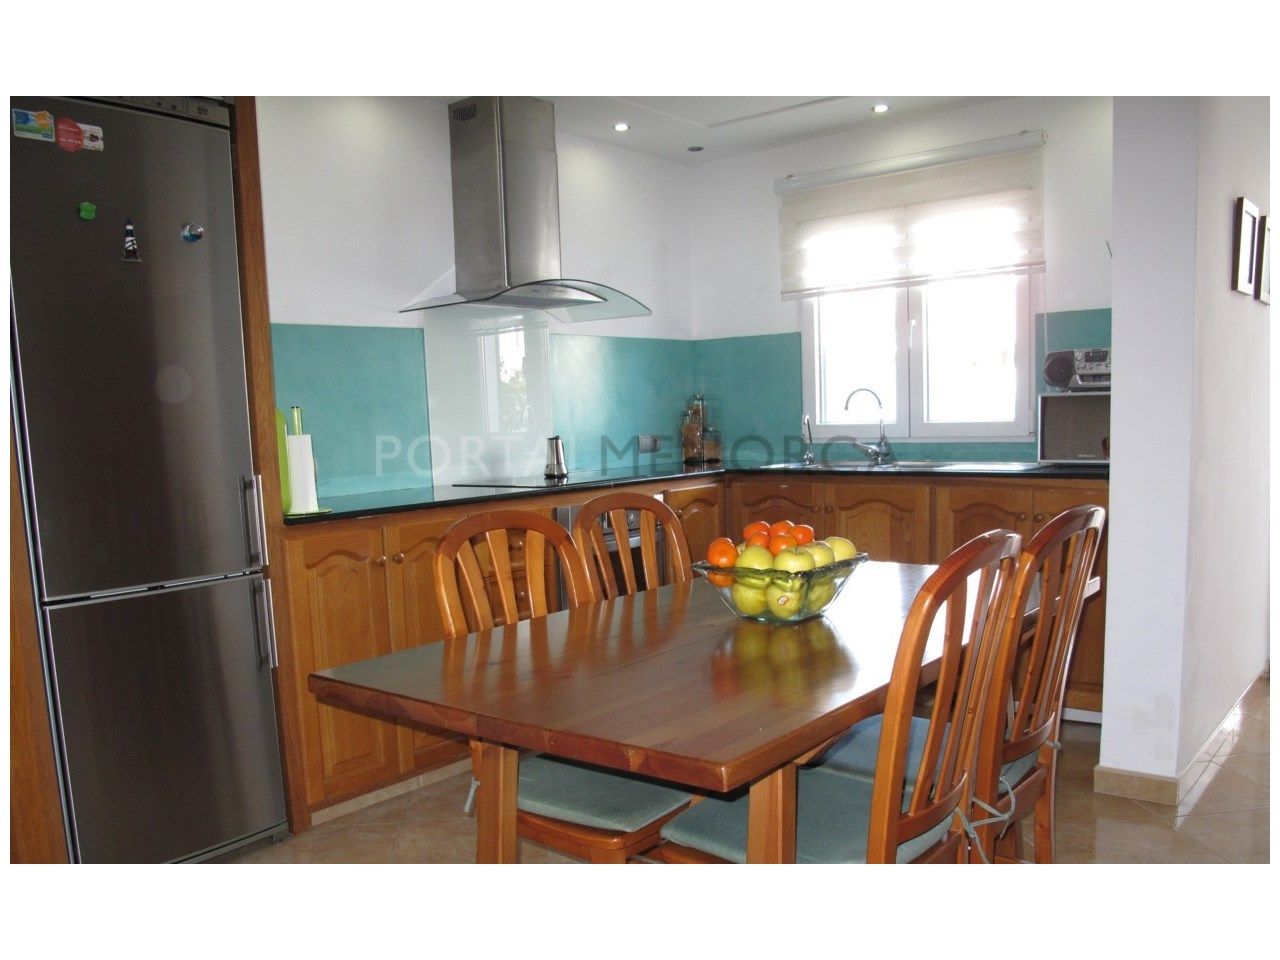 Charming villa with garage in Son Oleo for sale-Kitchen